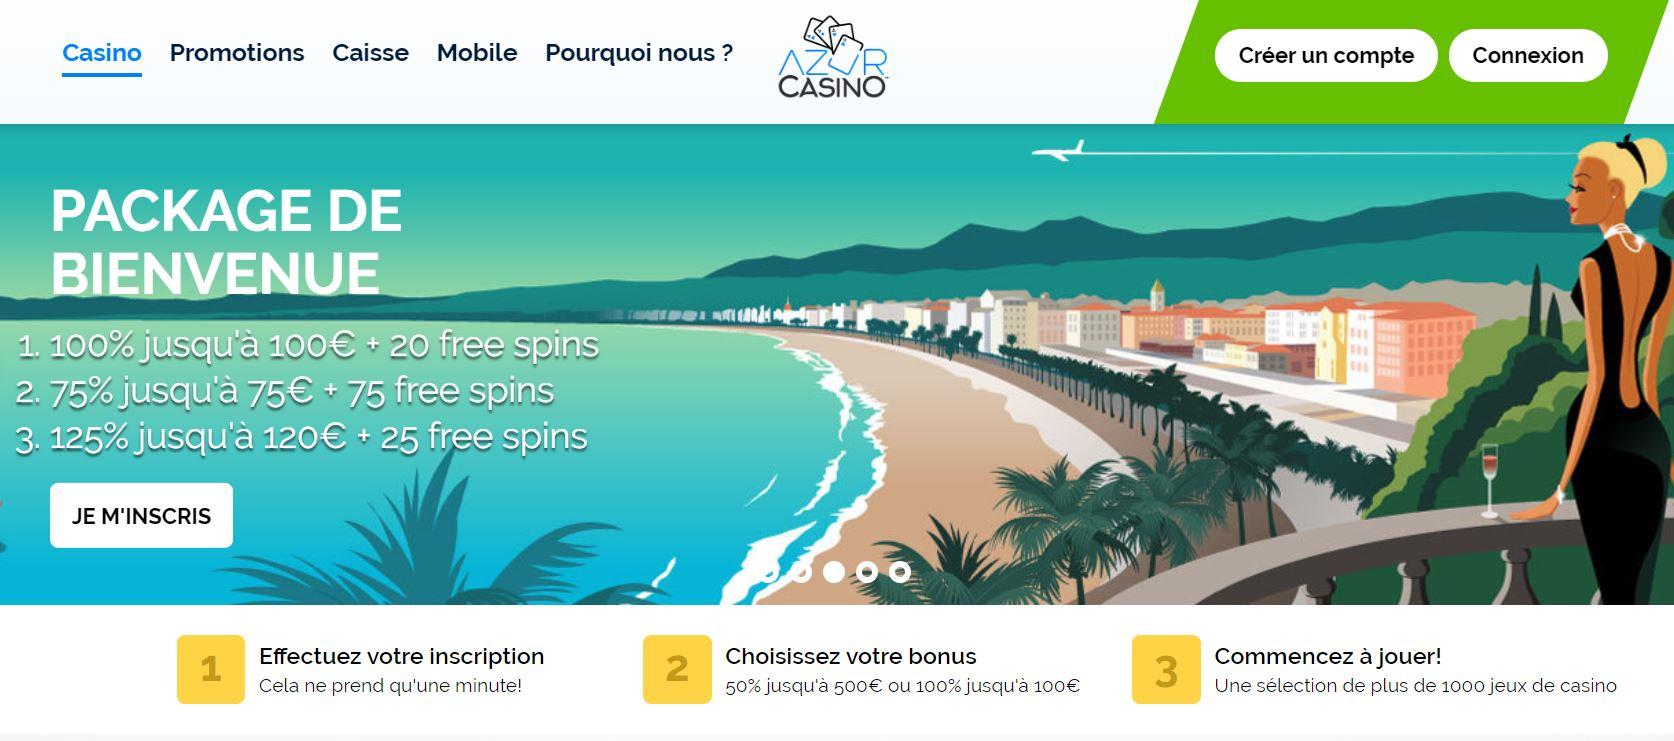 Azur casino 2 - capture écran